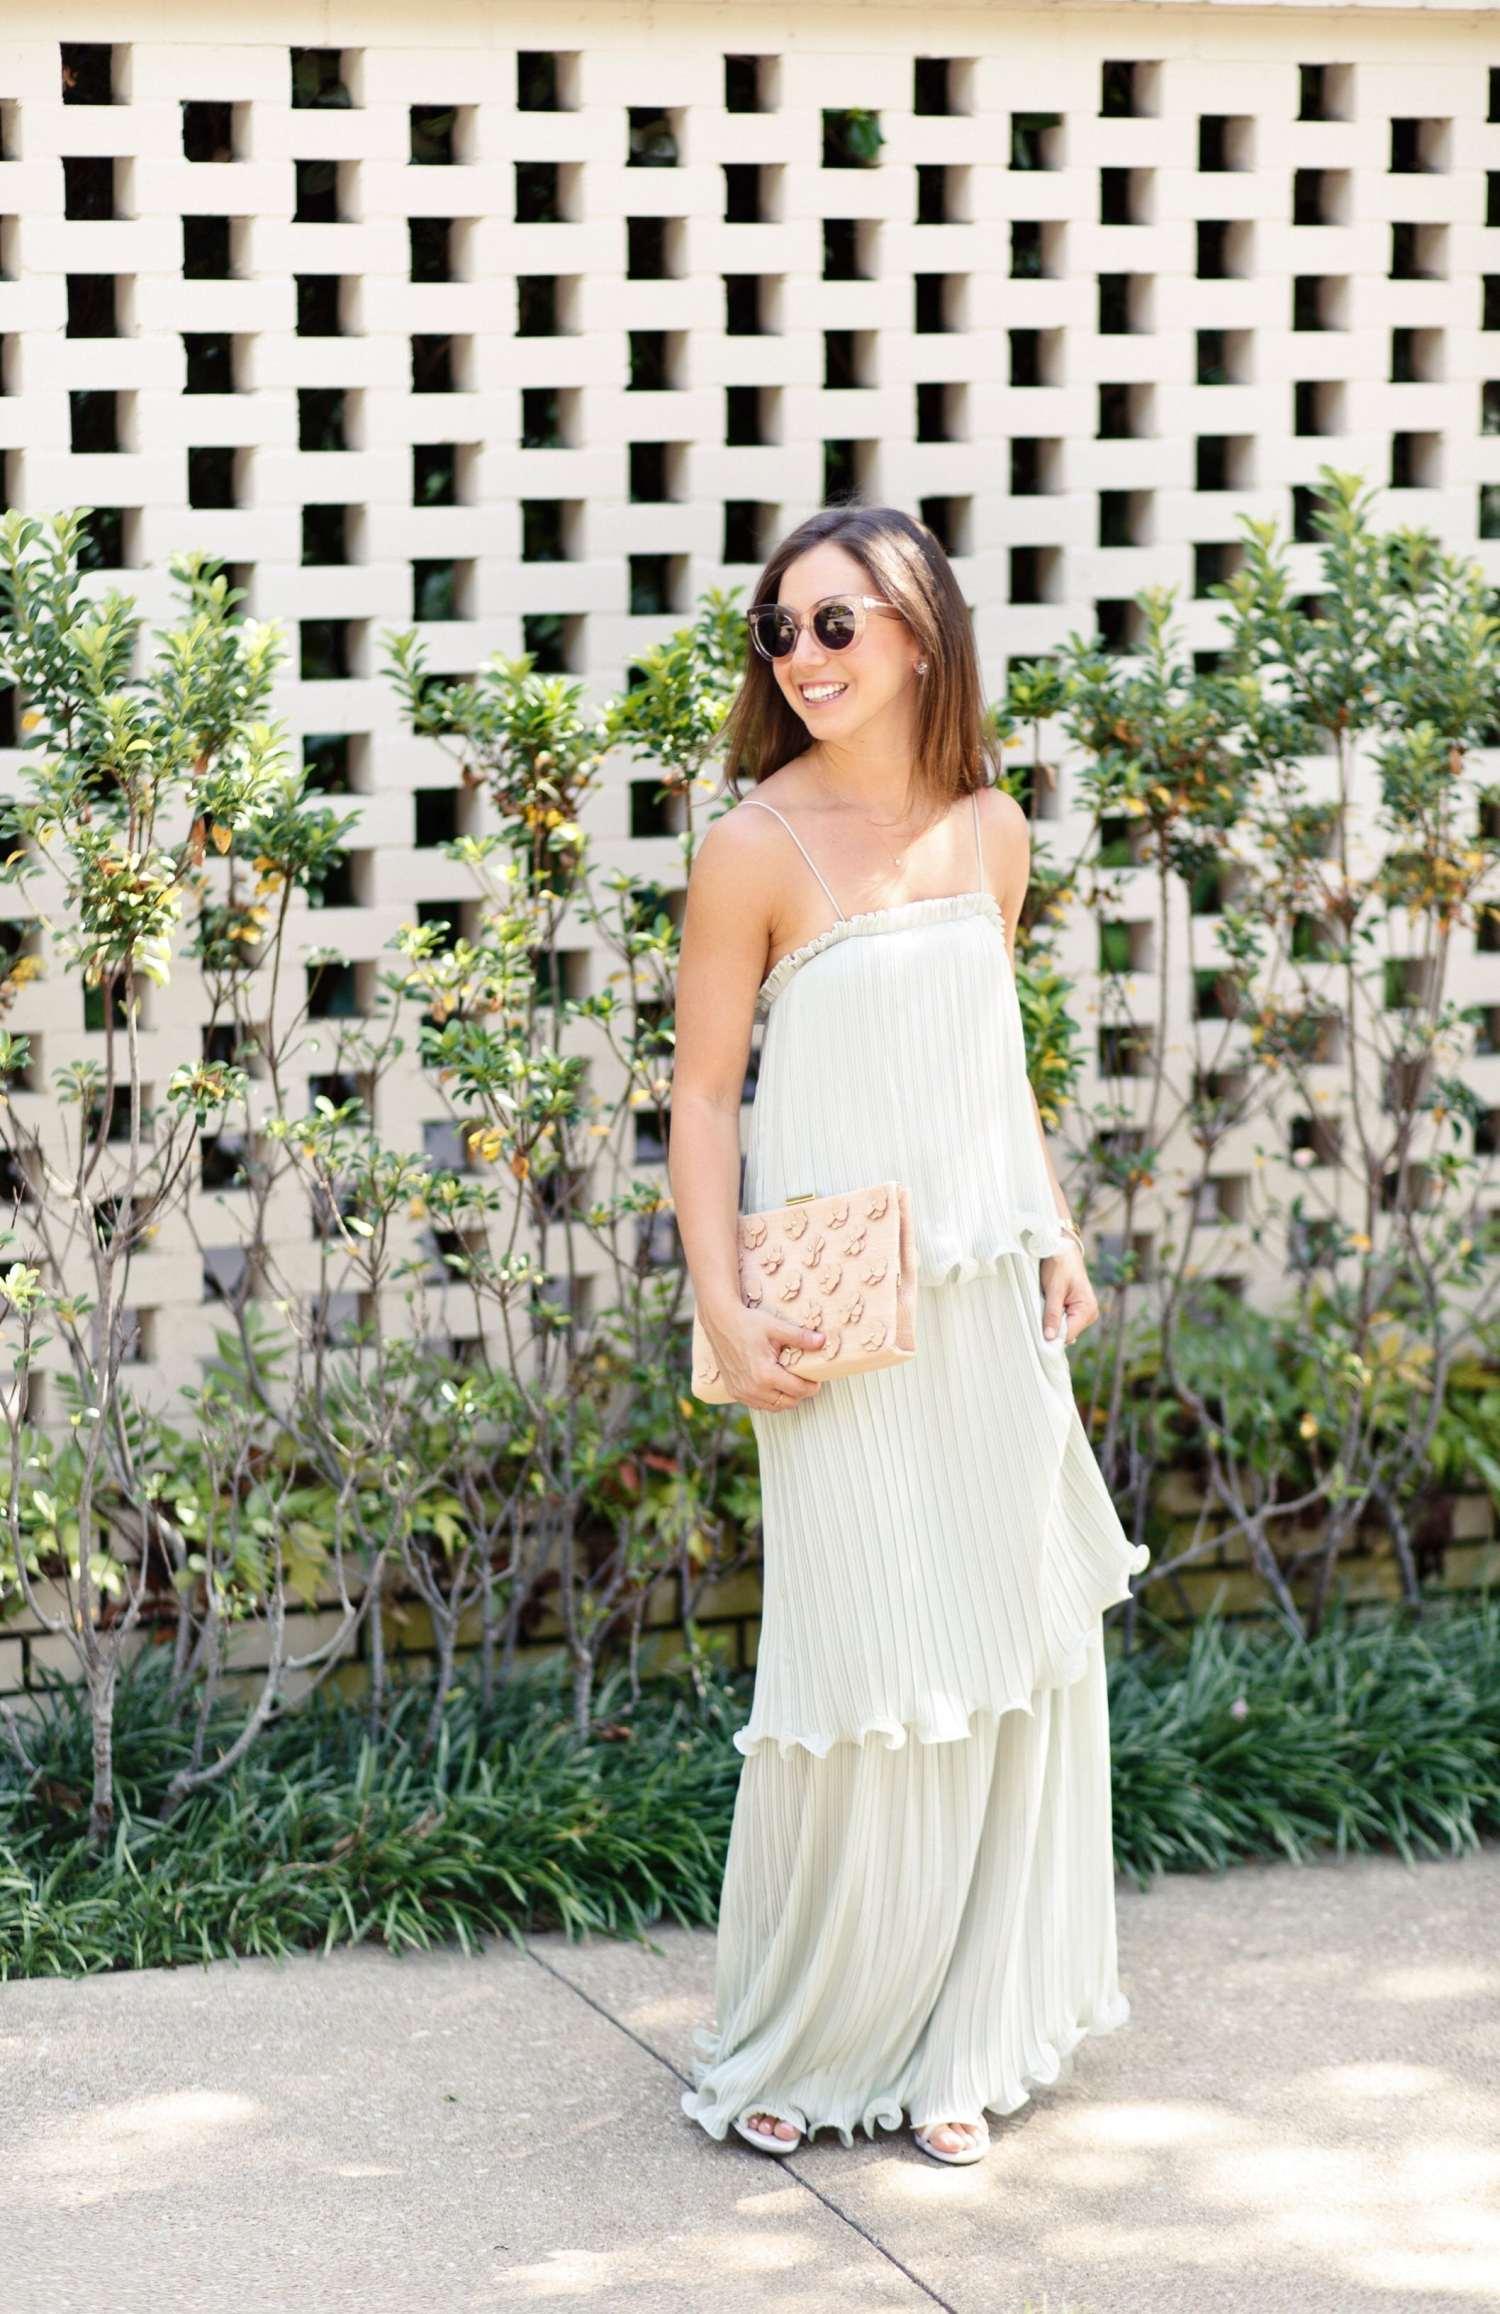 Asos petite wedding guest dresses for Petite dresses for a wedding guest